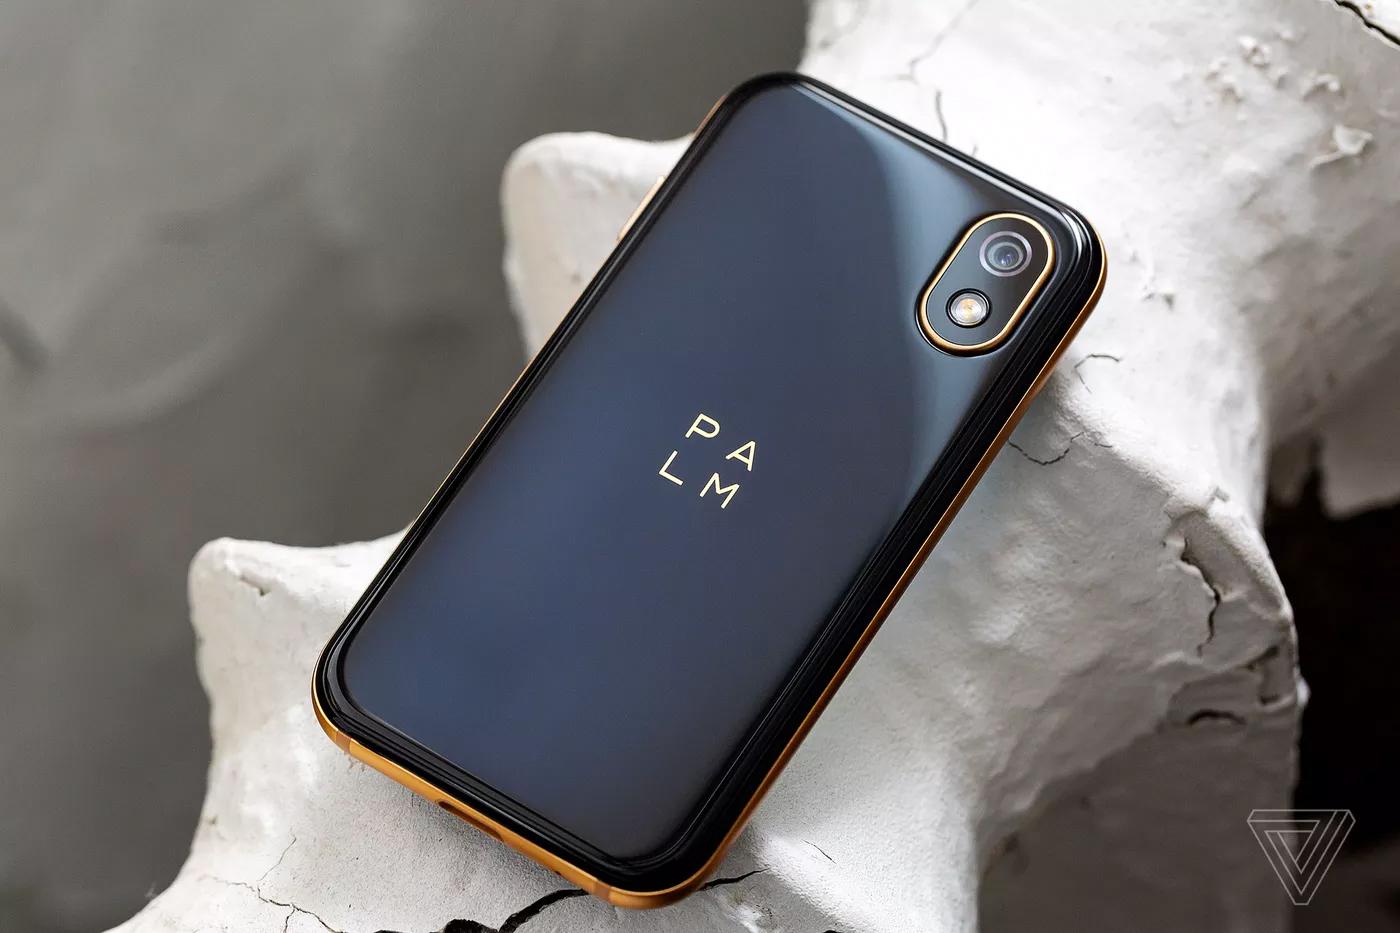 Представлен самый небольшой смартфон на андроид